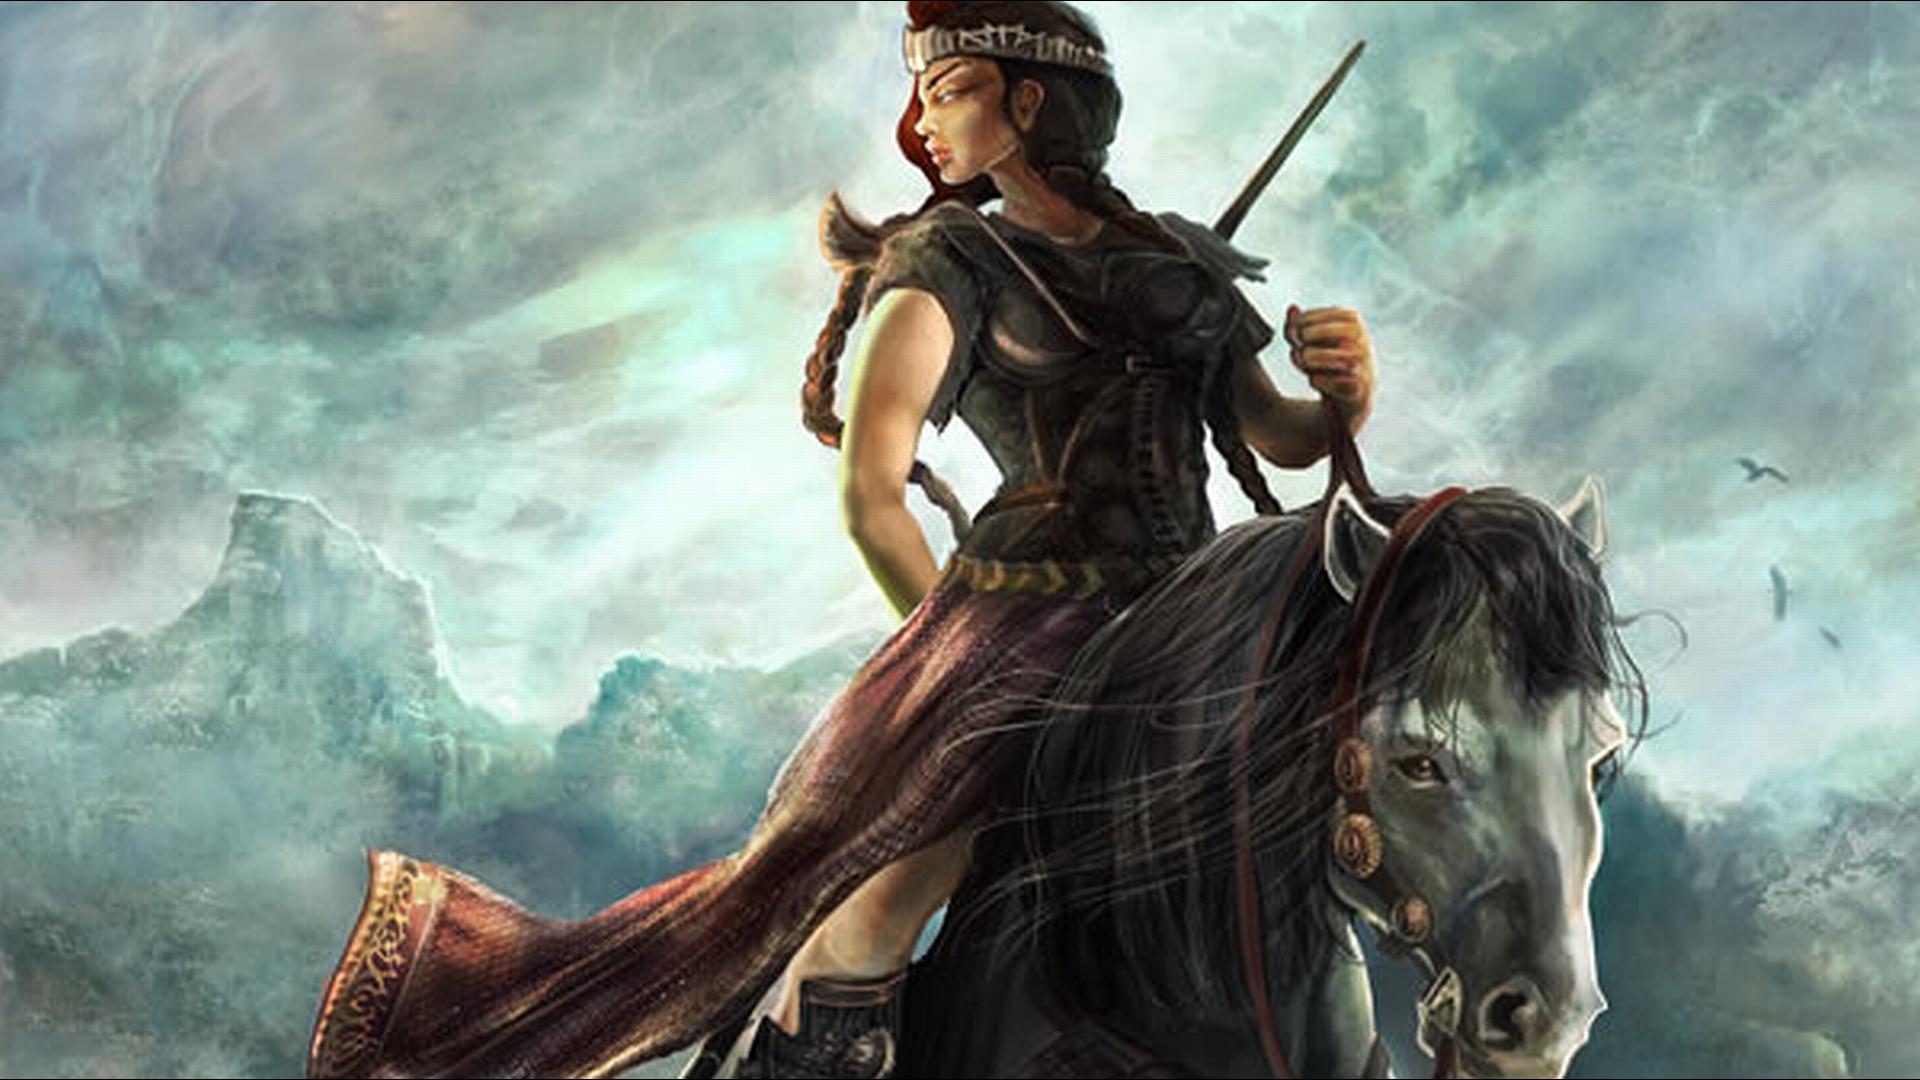 download wallpaper female warrior - photo #14